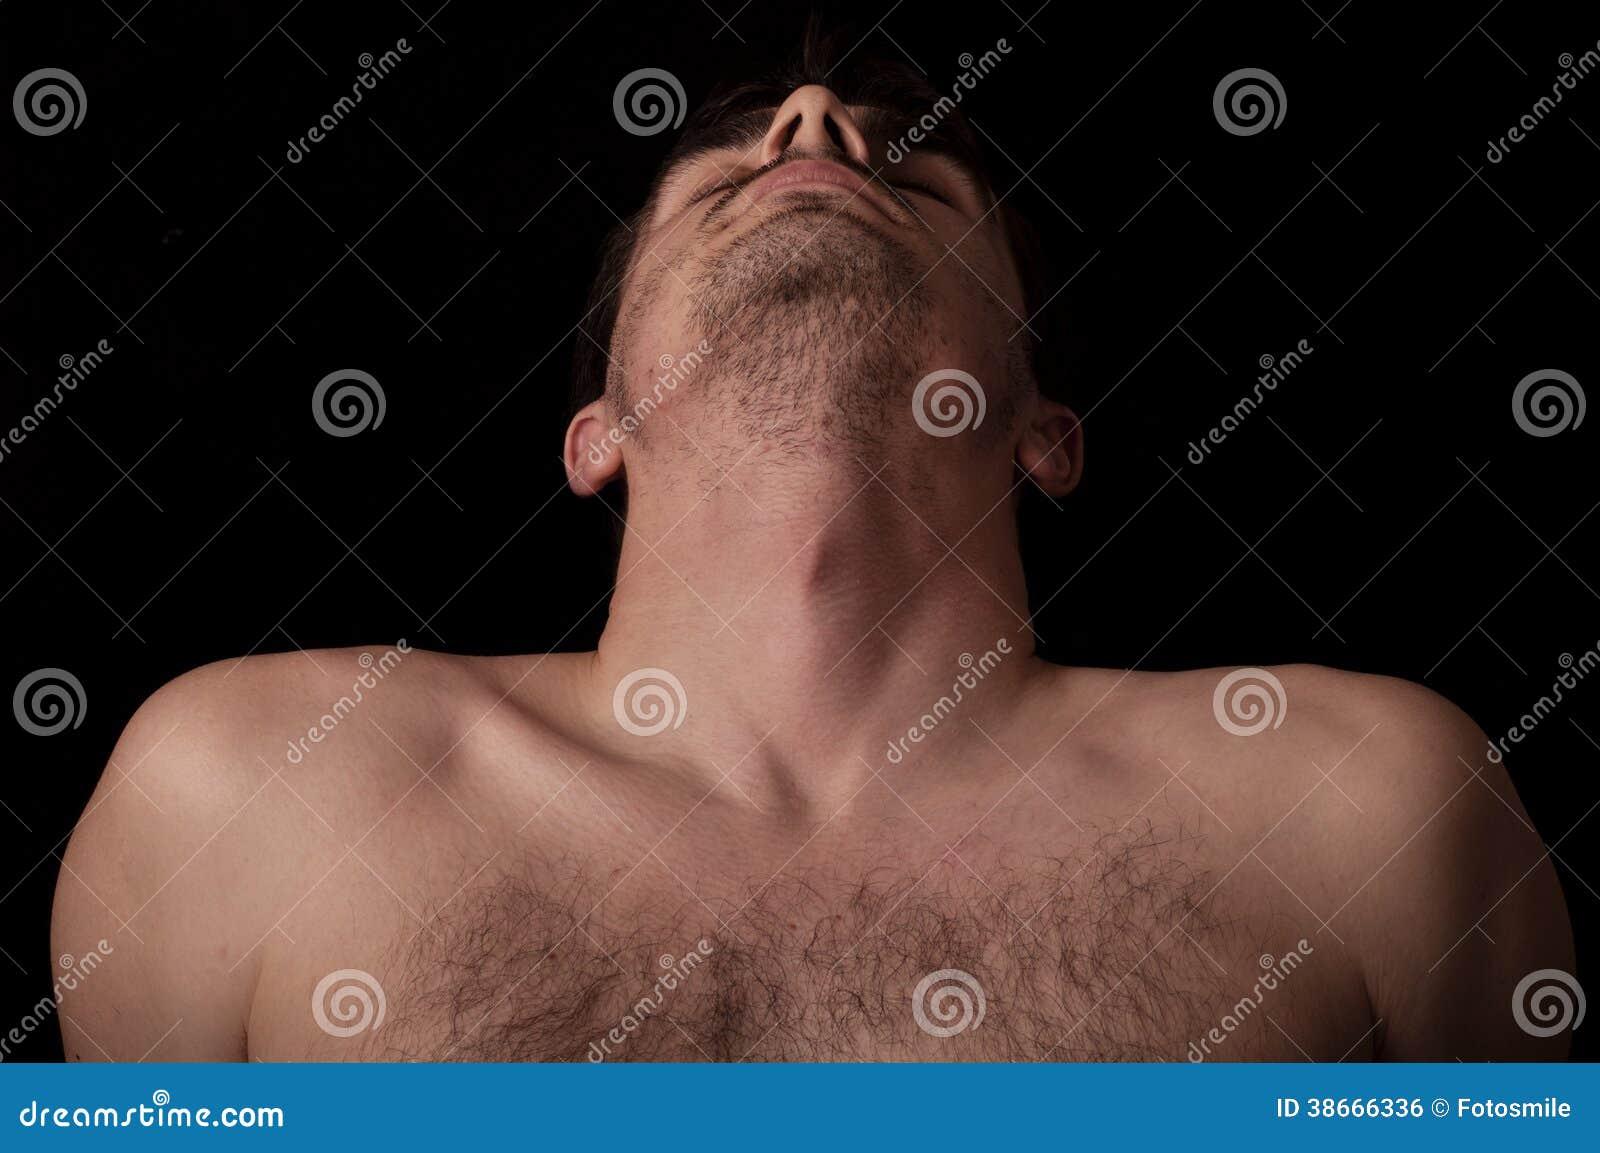 Head tilted back stock photo. Image of black, anatomy - 38666336